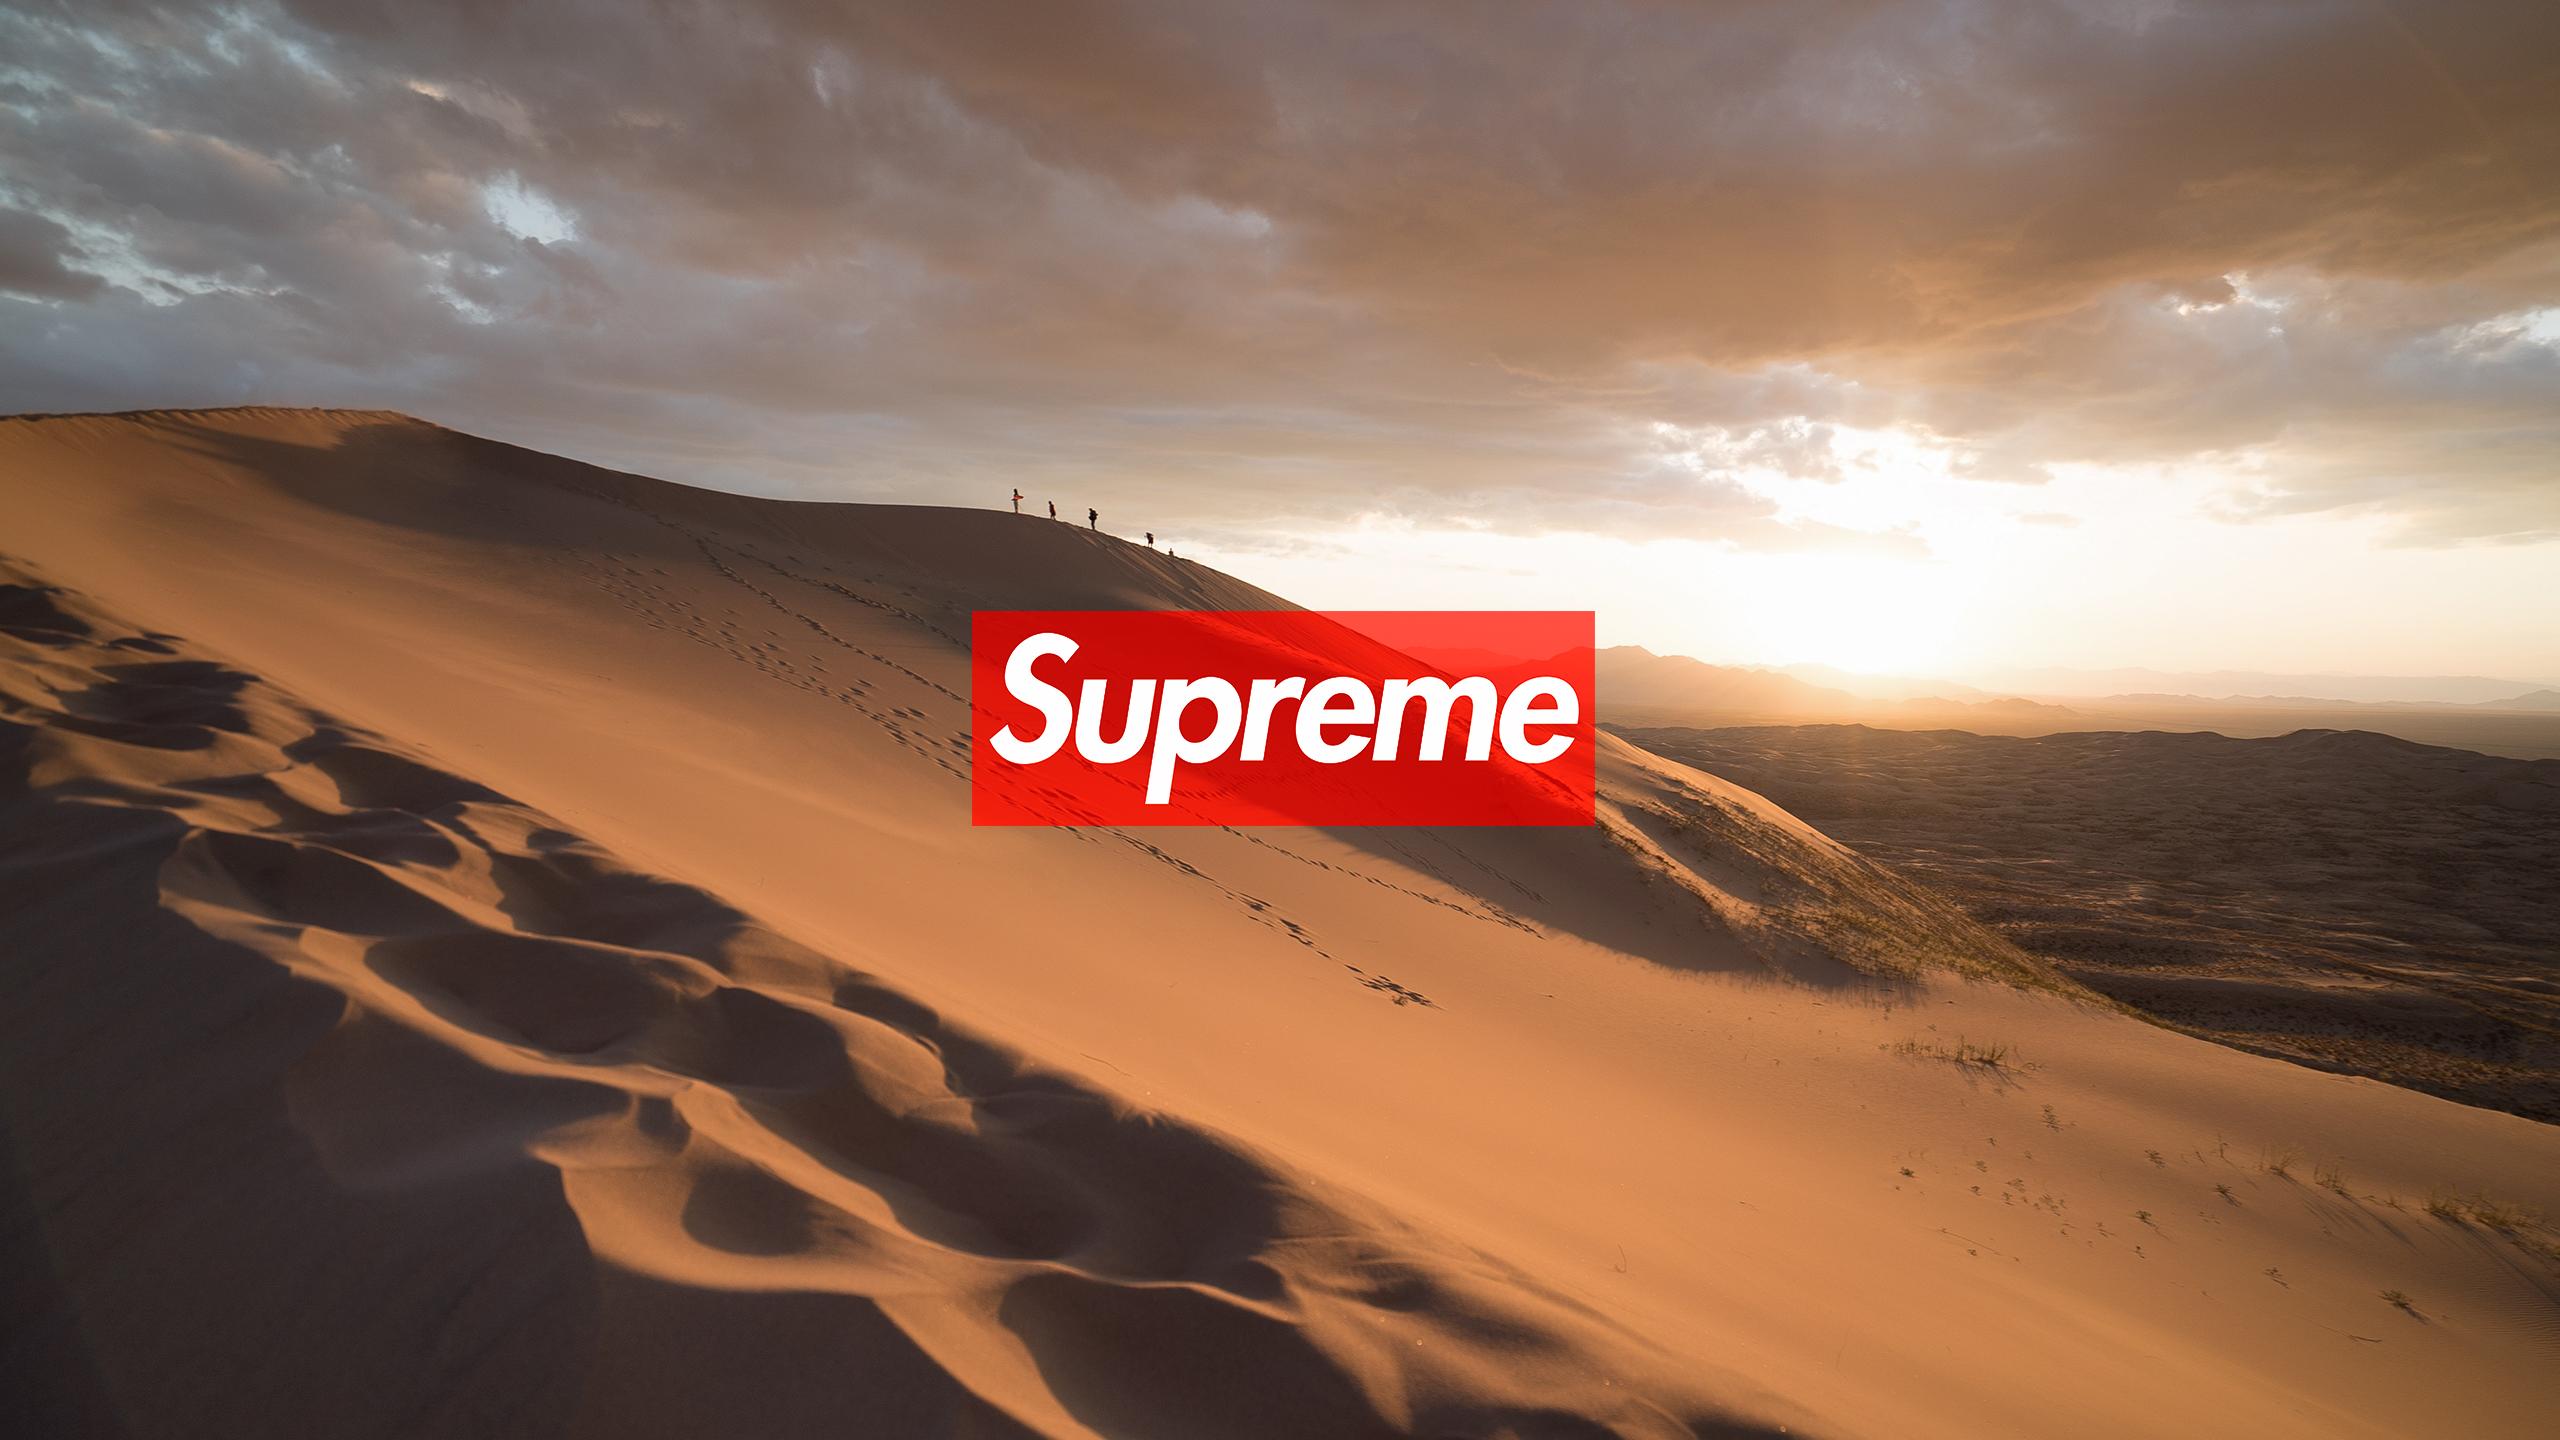 Supreme Desert Wallpaper Authenticsupremecom